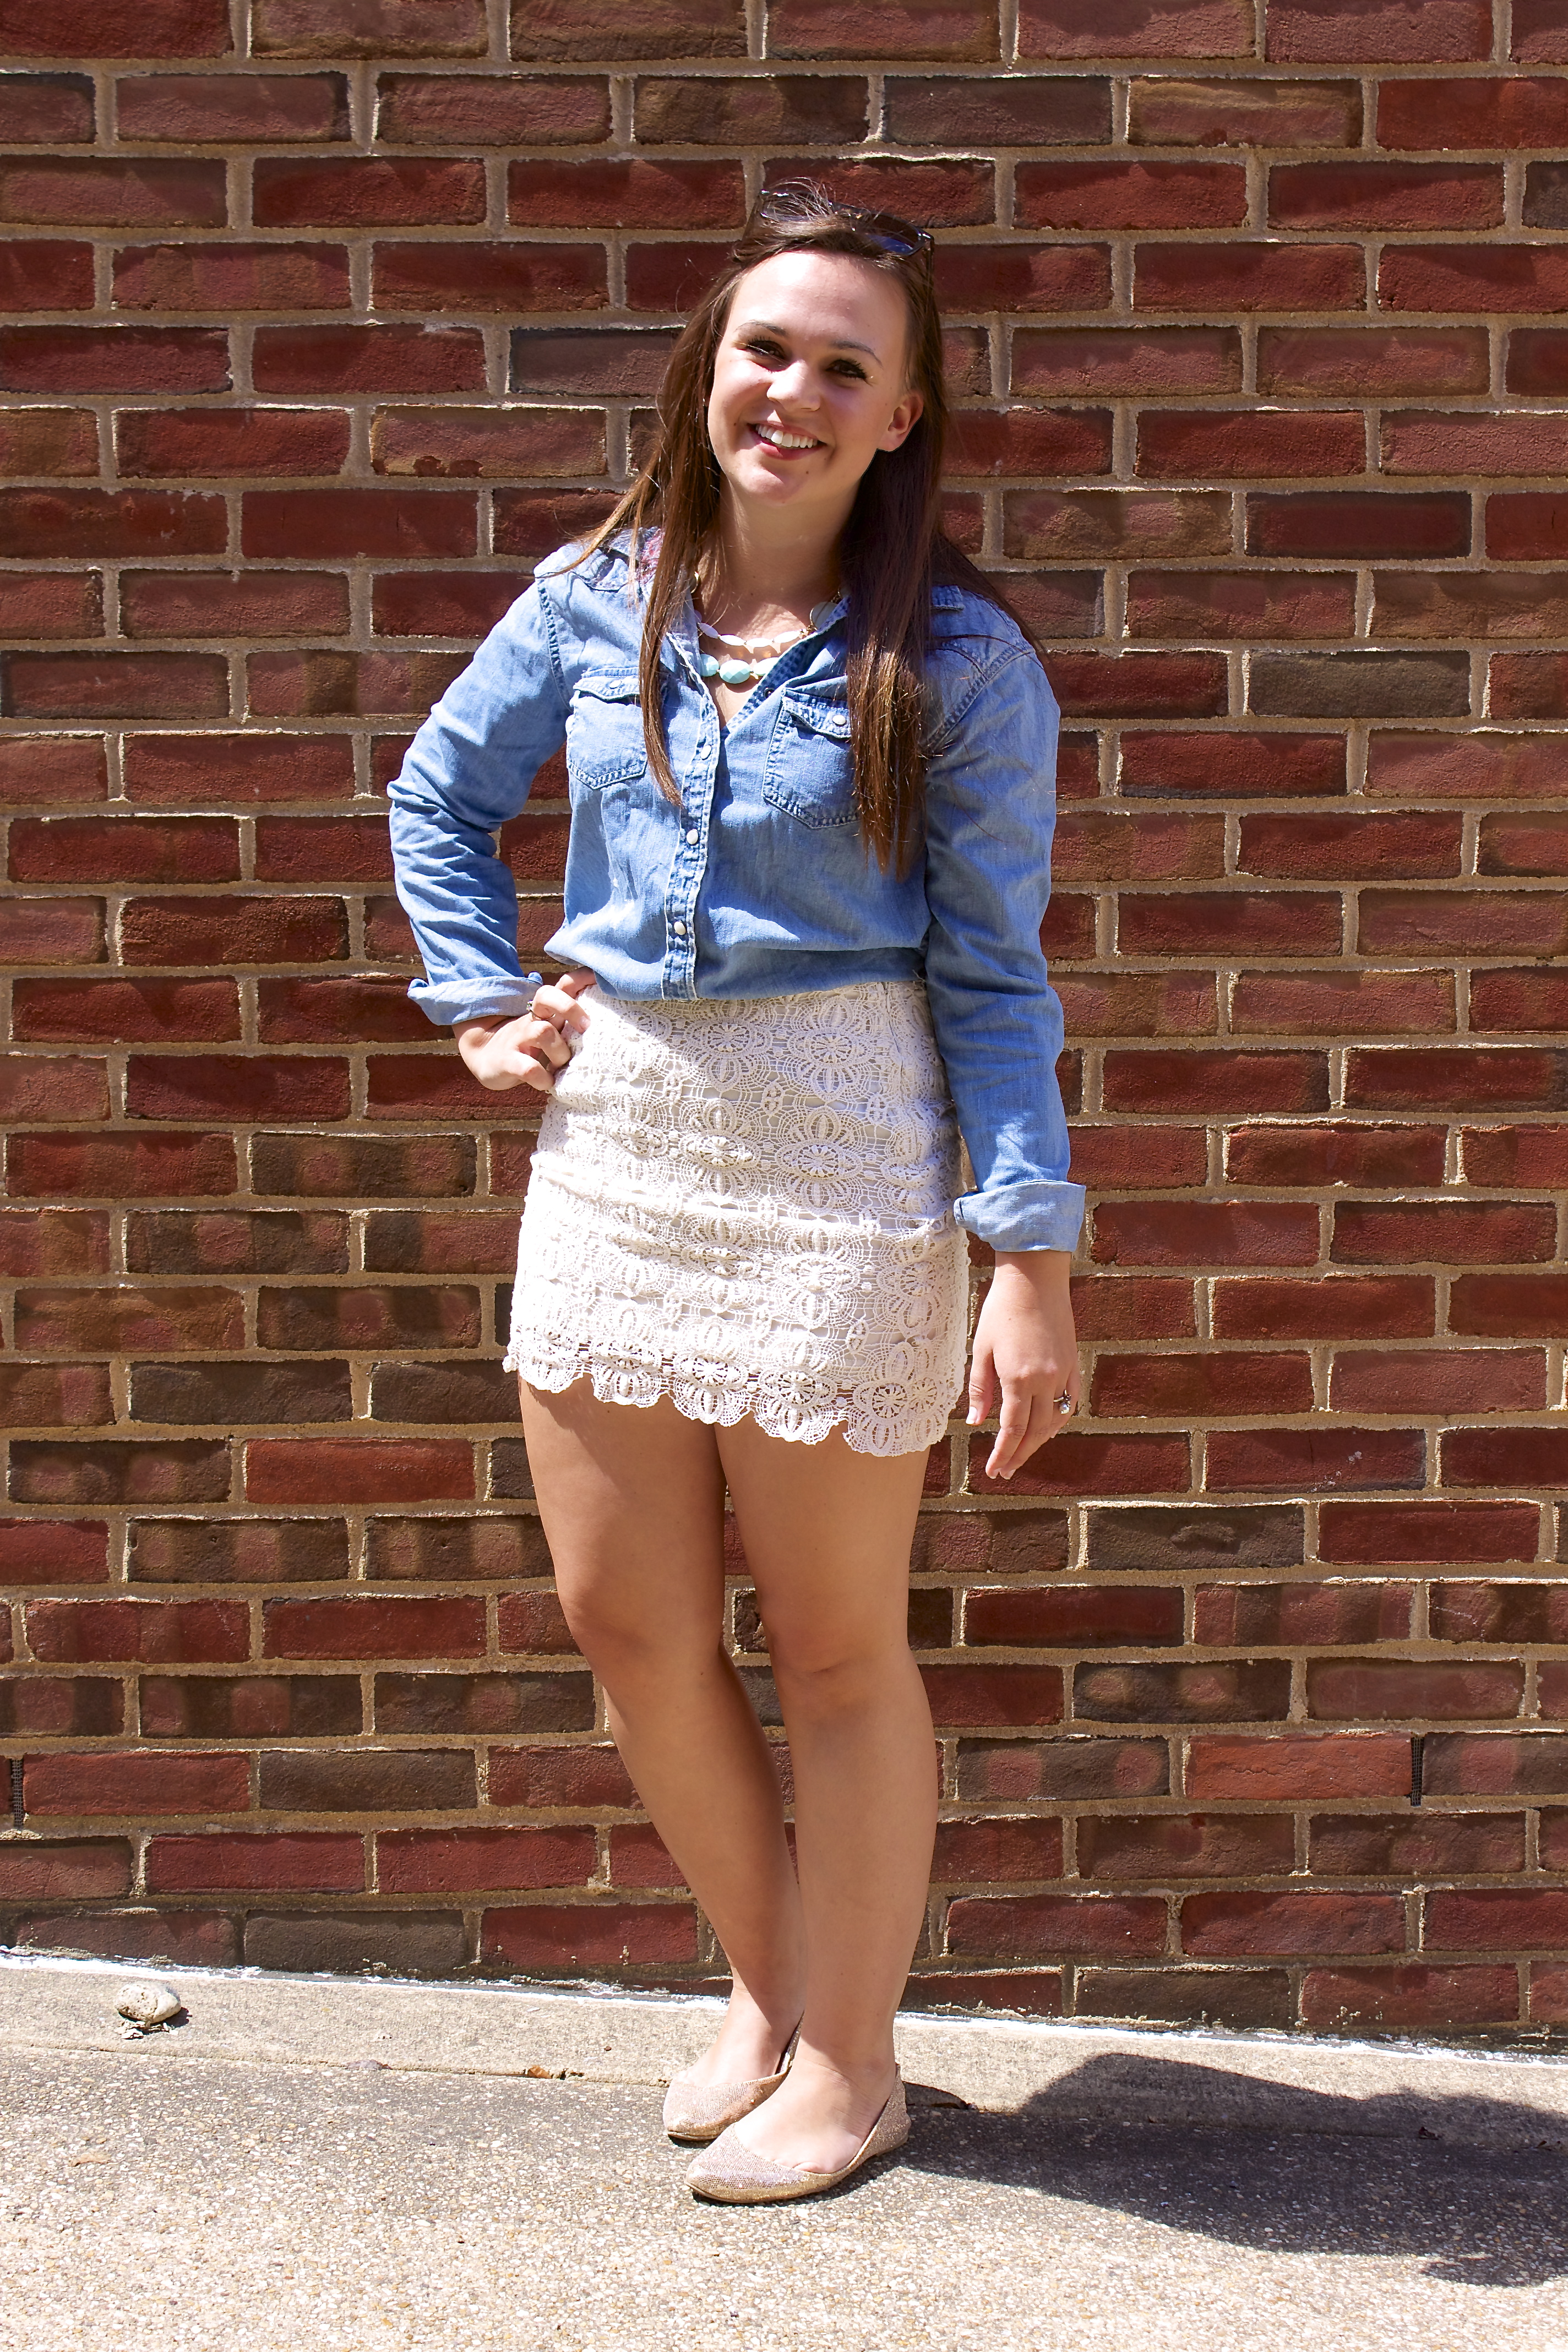 Dressing to Impress at George Washington University | HuffPost